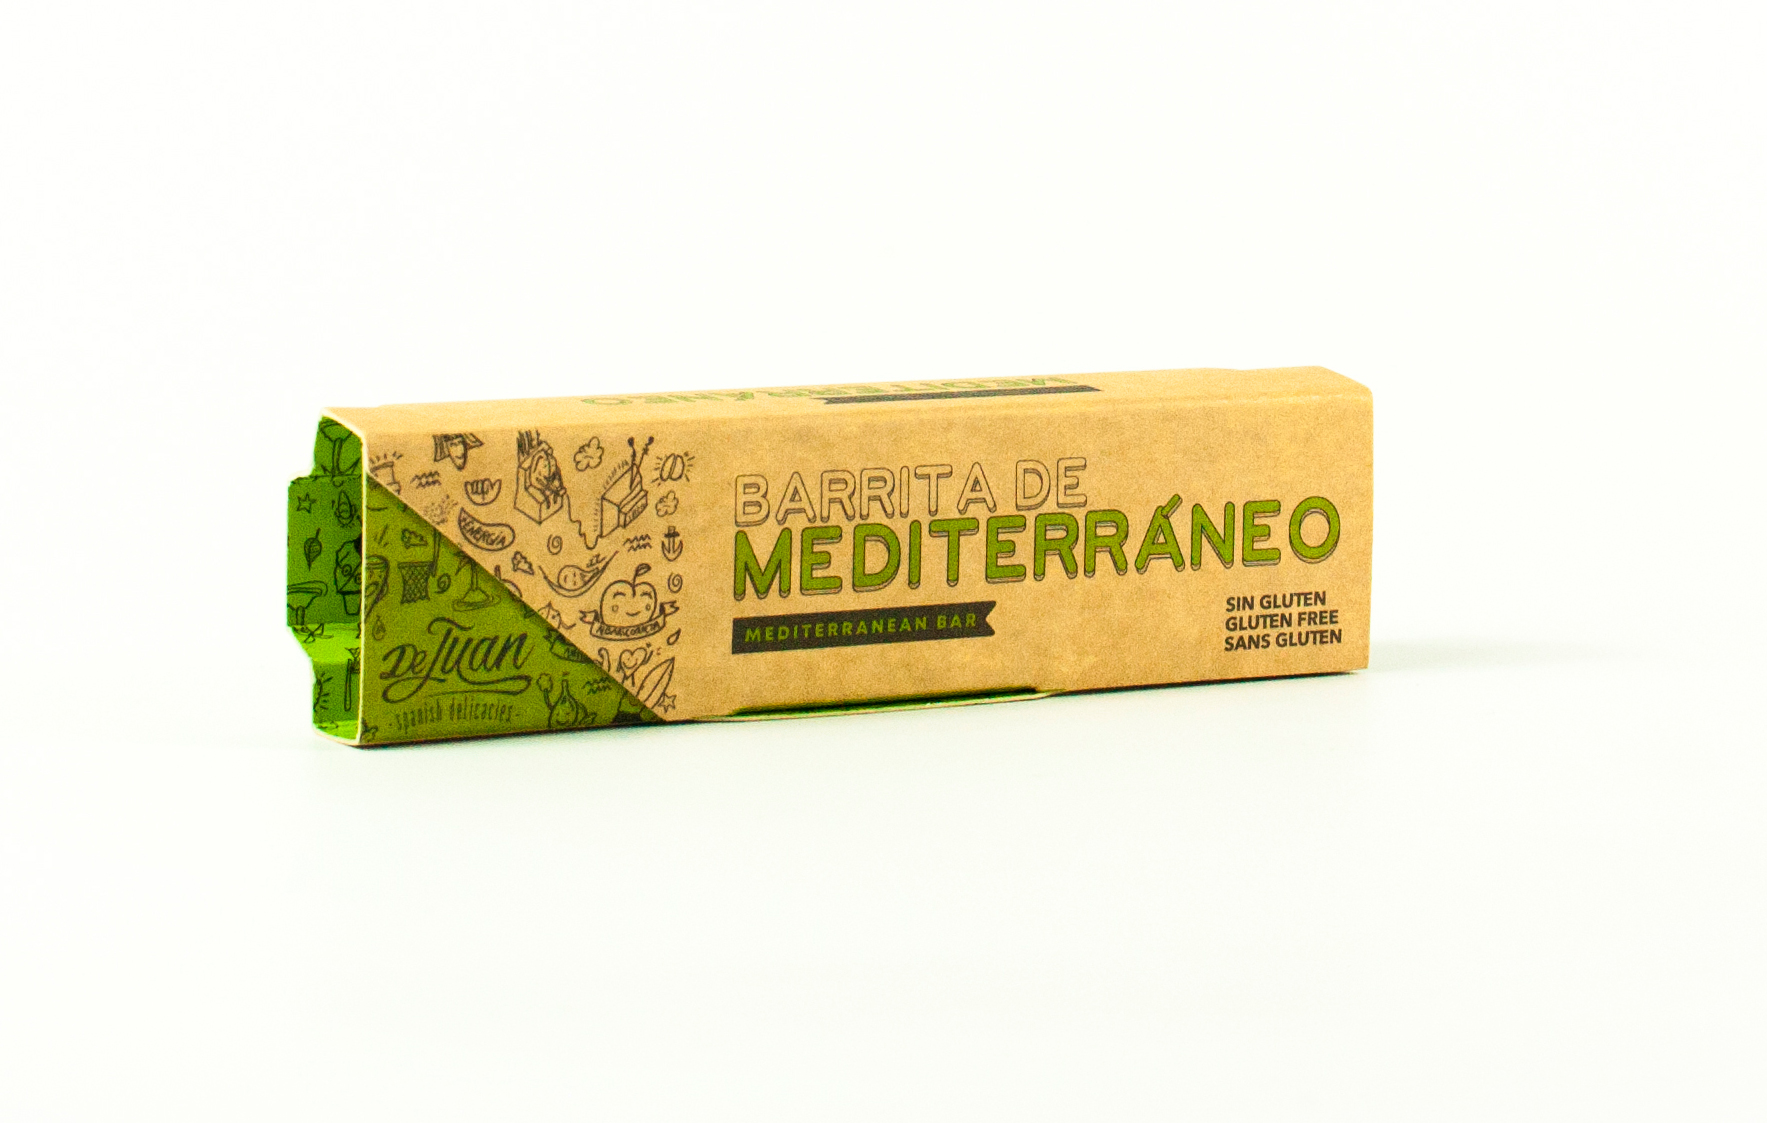 barrita-mediterraneo